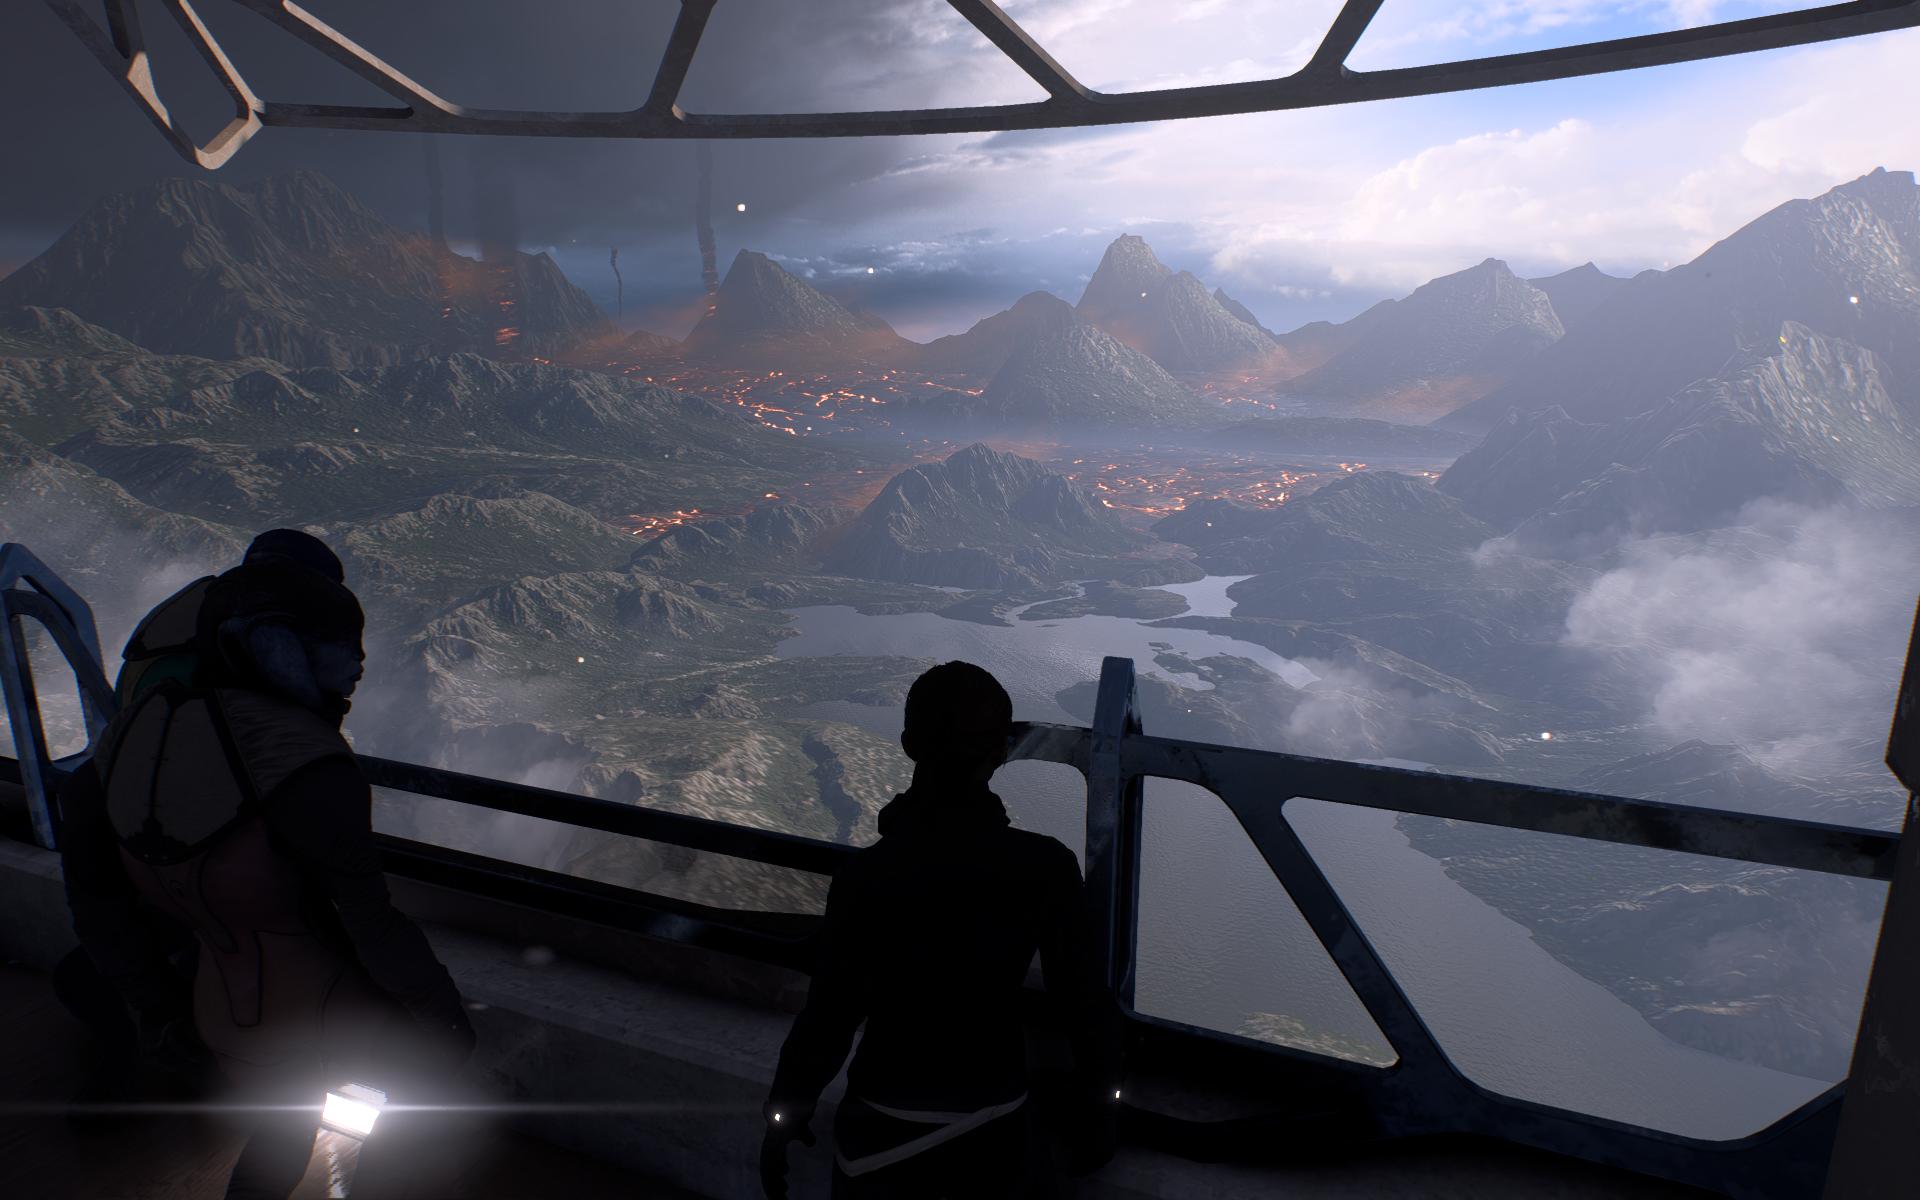 Mass Effect Andromeda Screenshot  - 20.15.03.88.png - Mass Effect: Andromeda